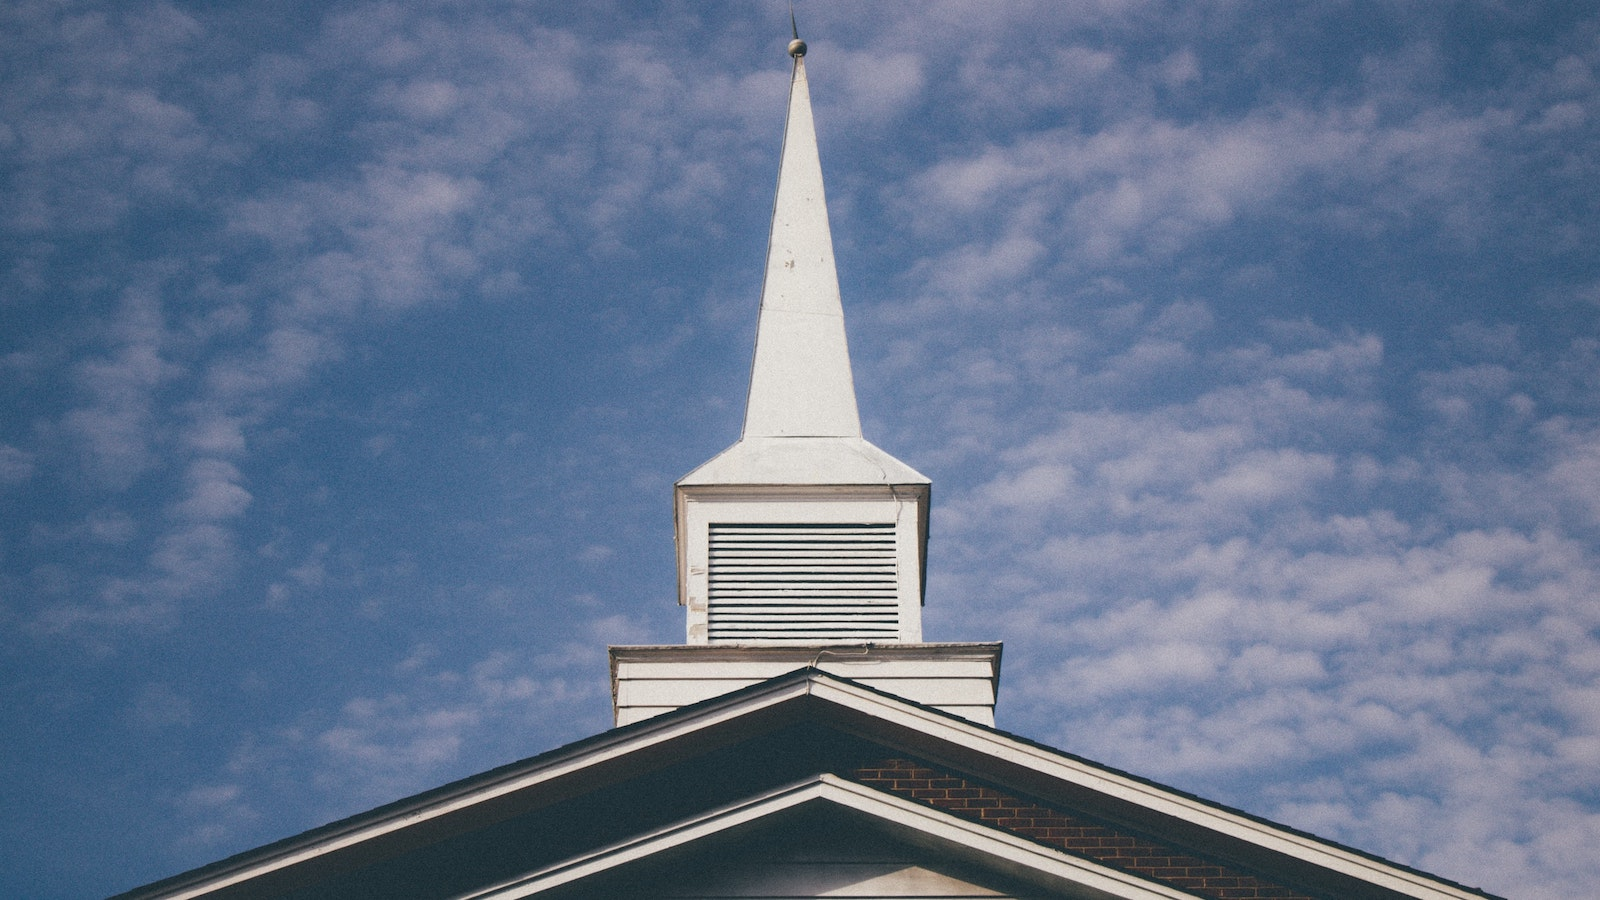 Steeple of a Baptist church